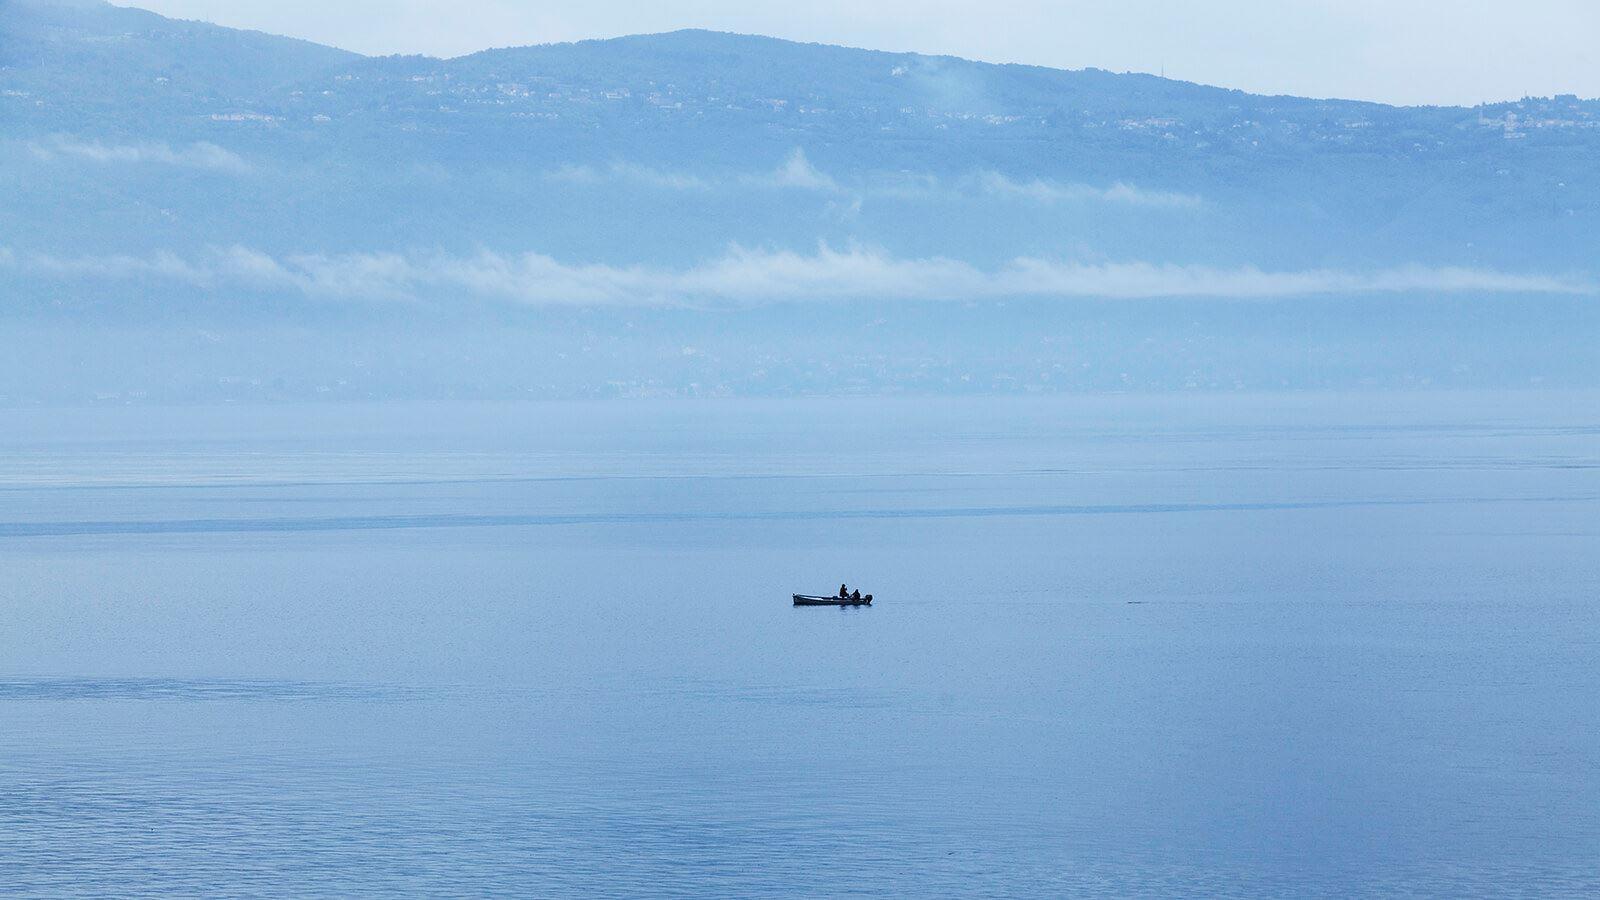 Grand-Hotel-Villa-Feltrinelli-Lake-Garda-03-peacefull stillness